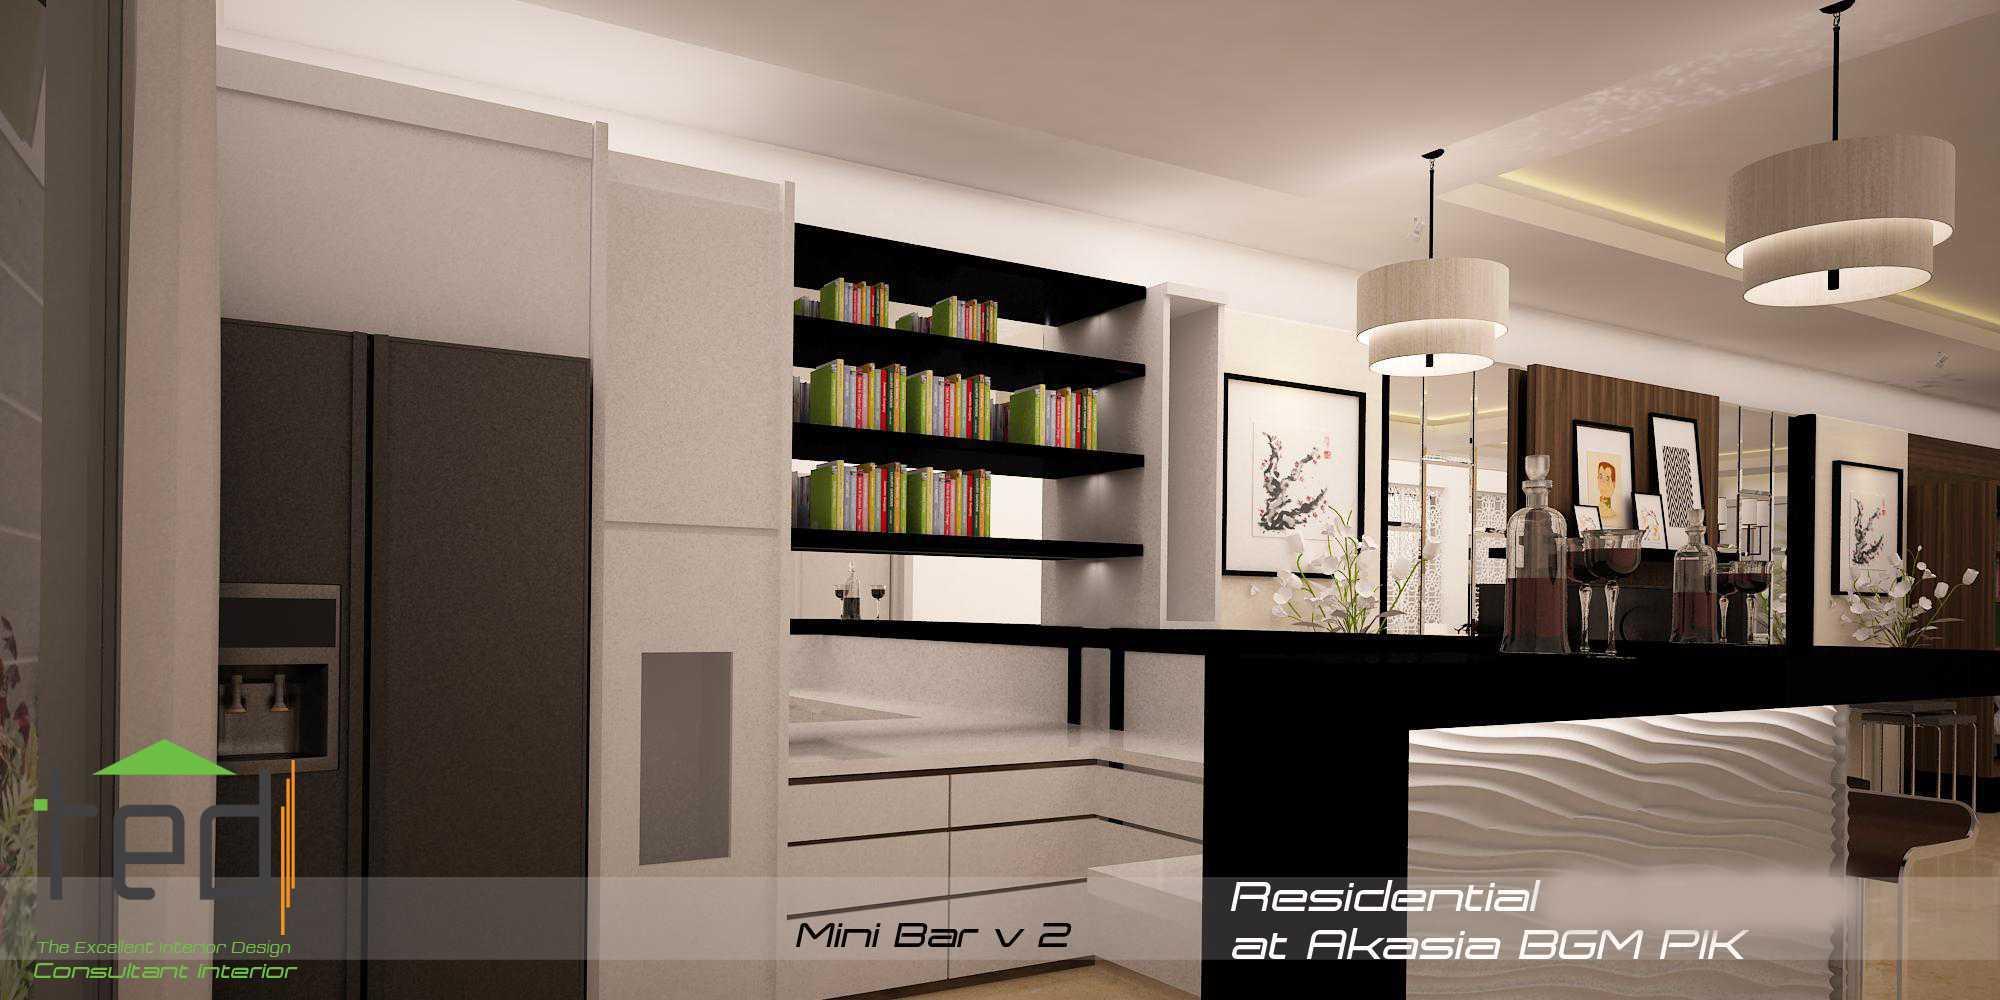 Pd Teguh Desain Indonesia Residential At Akasia Jakarta Jakarta Minibar-View-2-1 Modern  27635